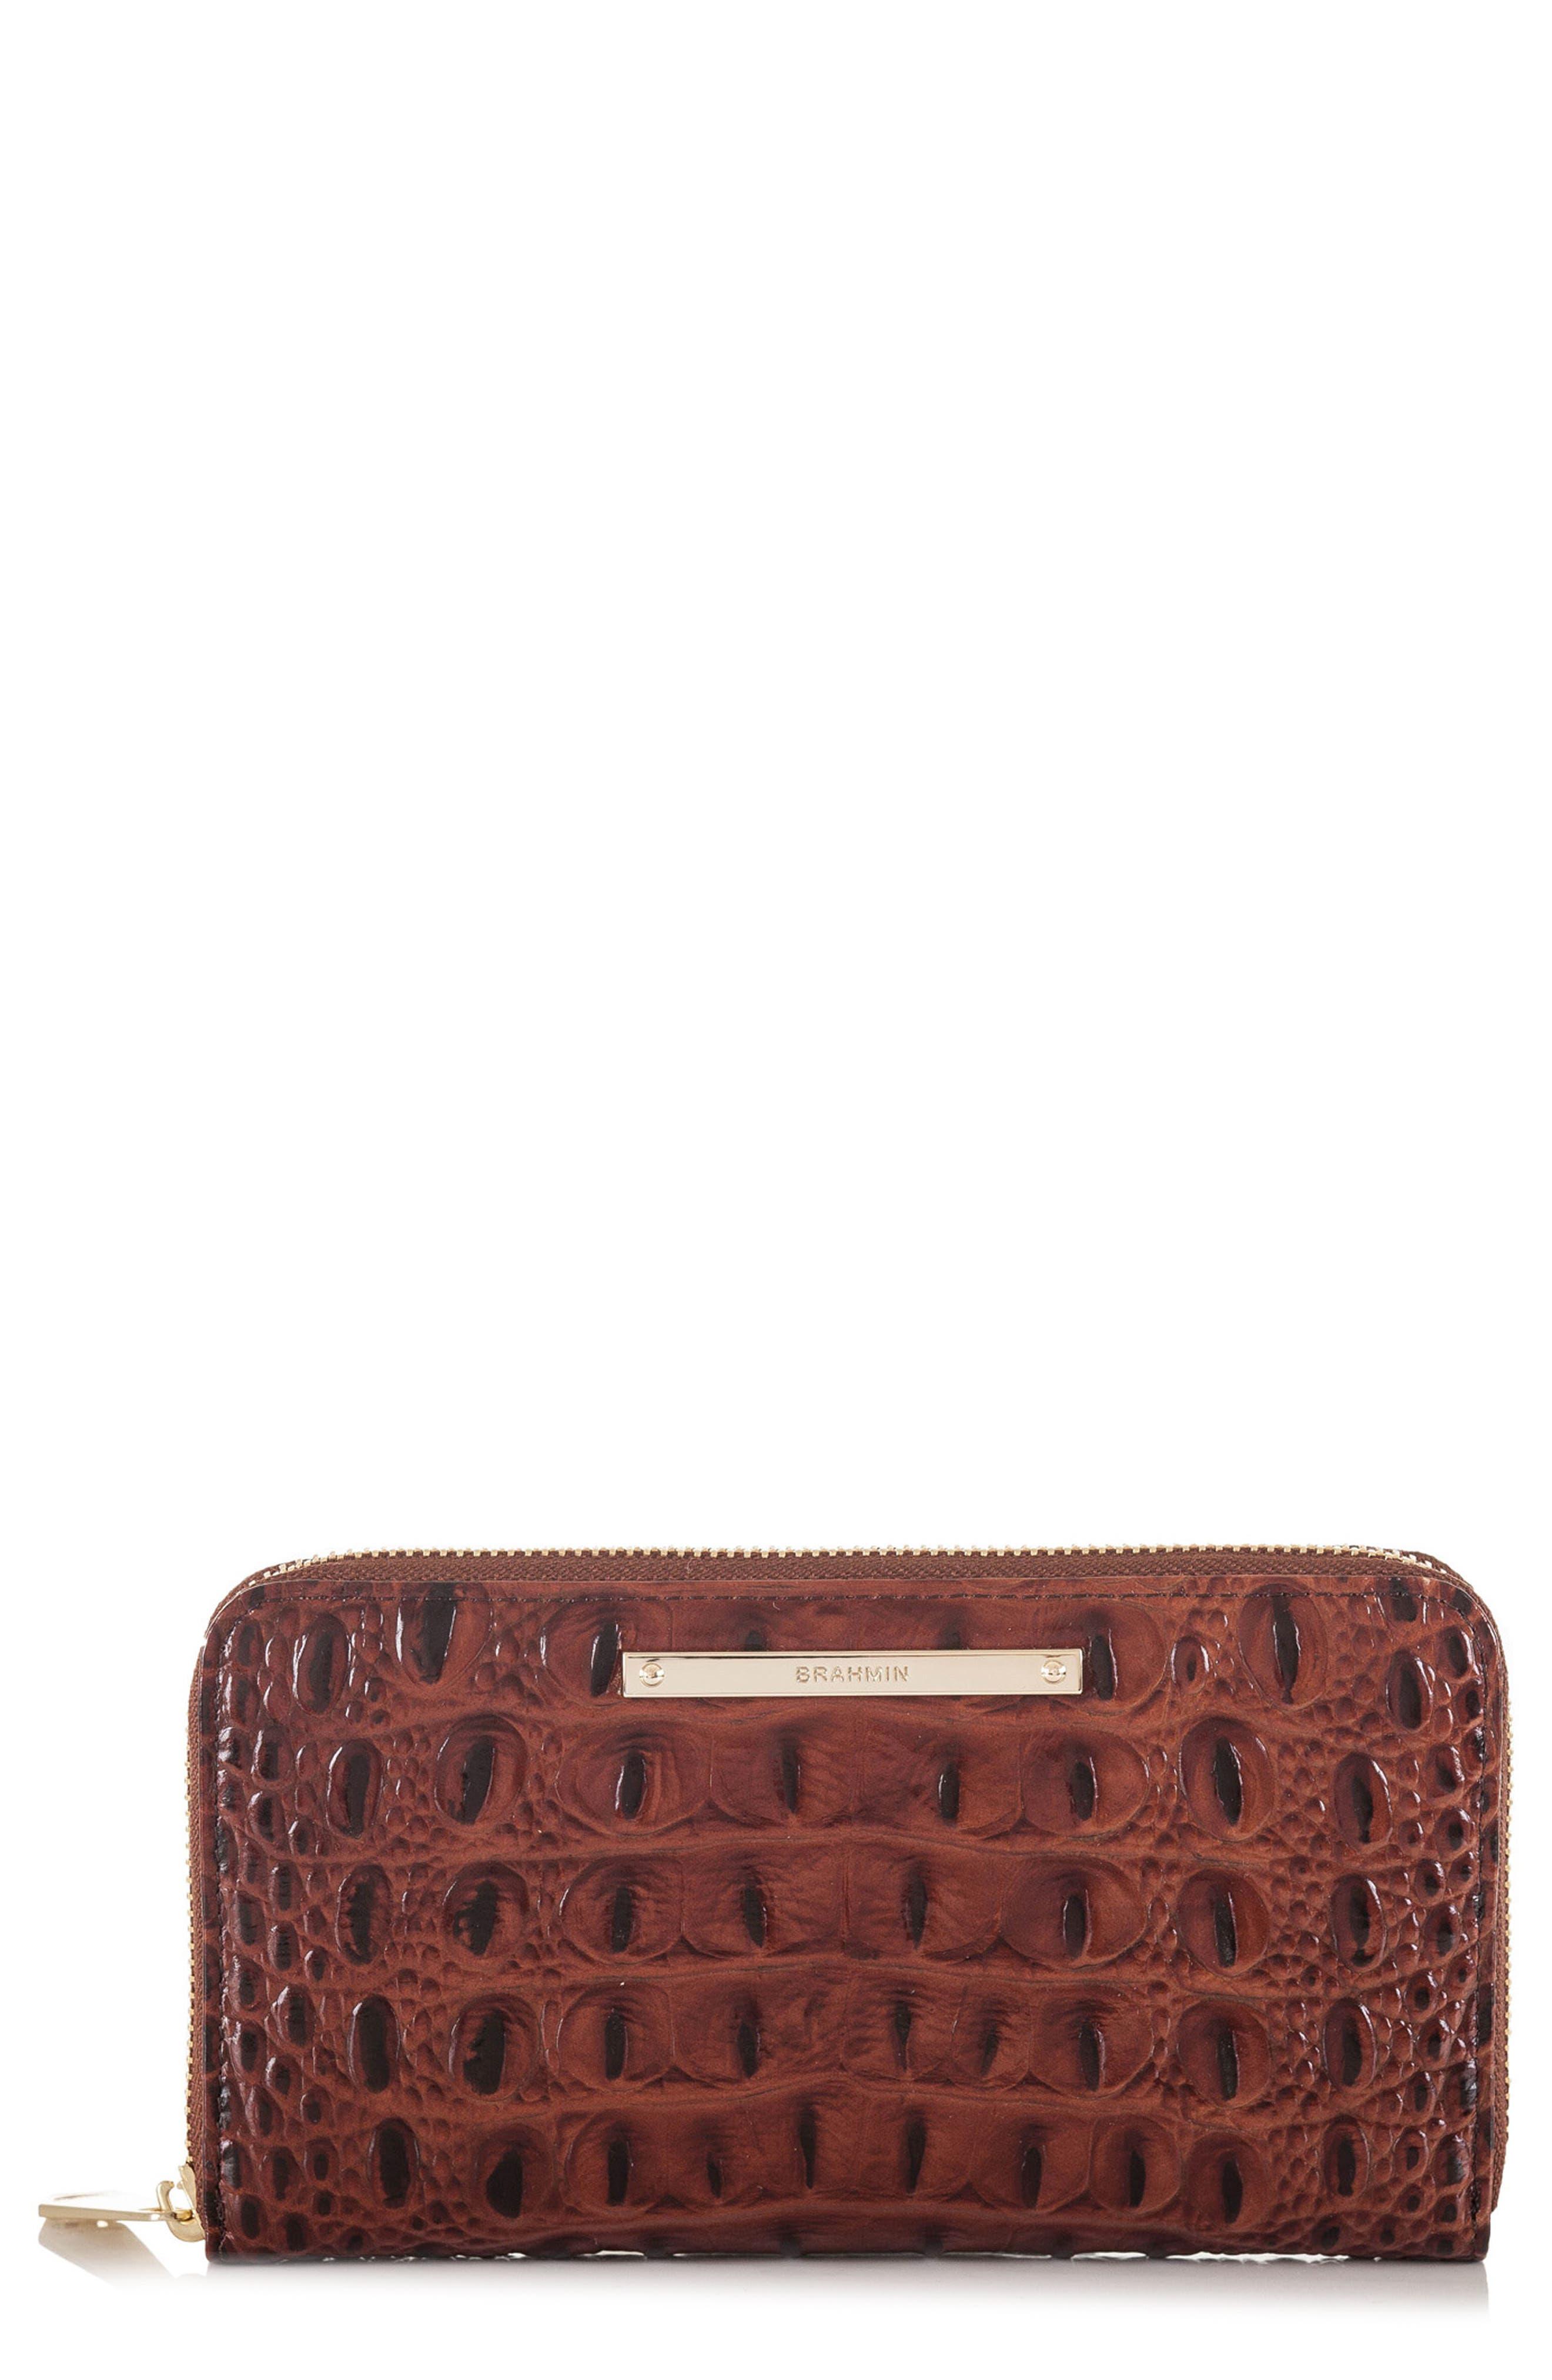 Main Image - Brahmin 'Suri' Zip Around Wallet